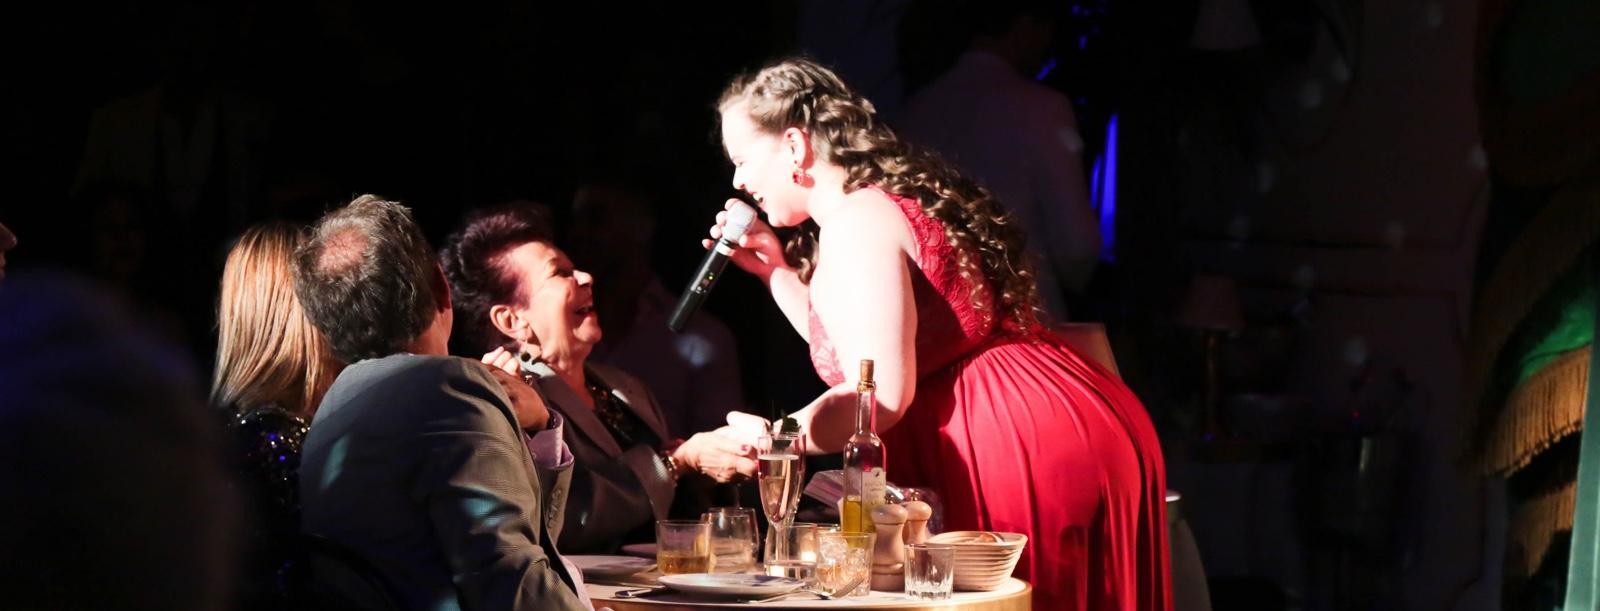 best latin clubs in miami, tucan club, dinner show miami, yoli mayor